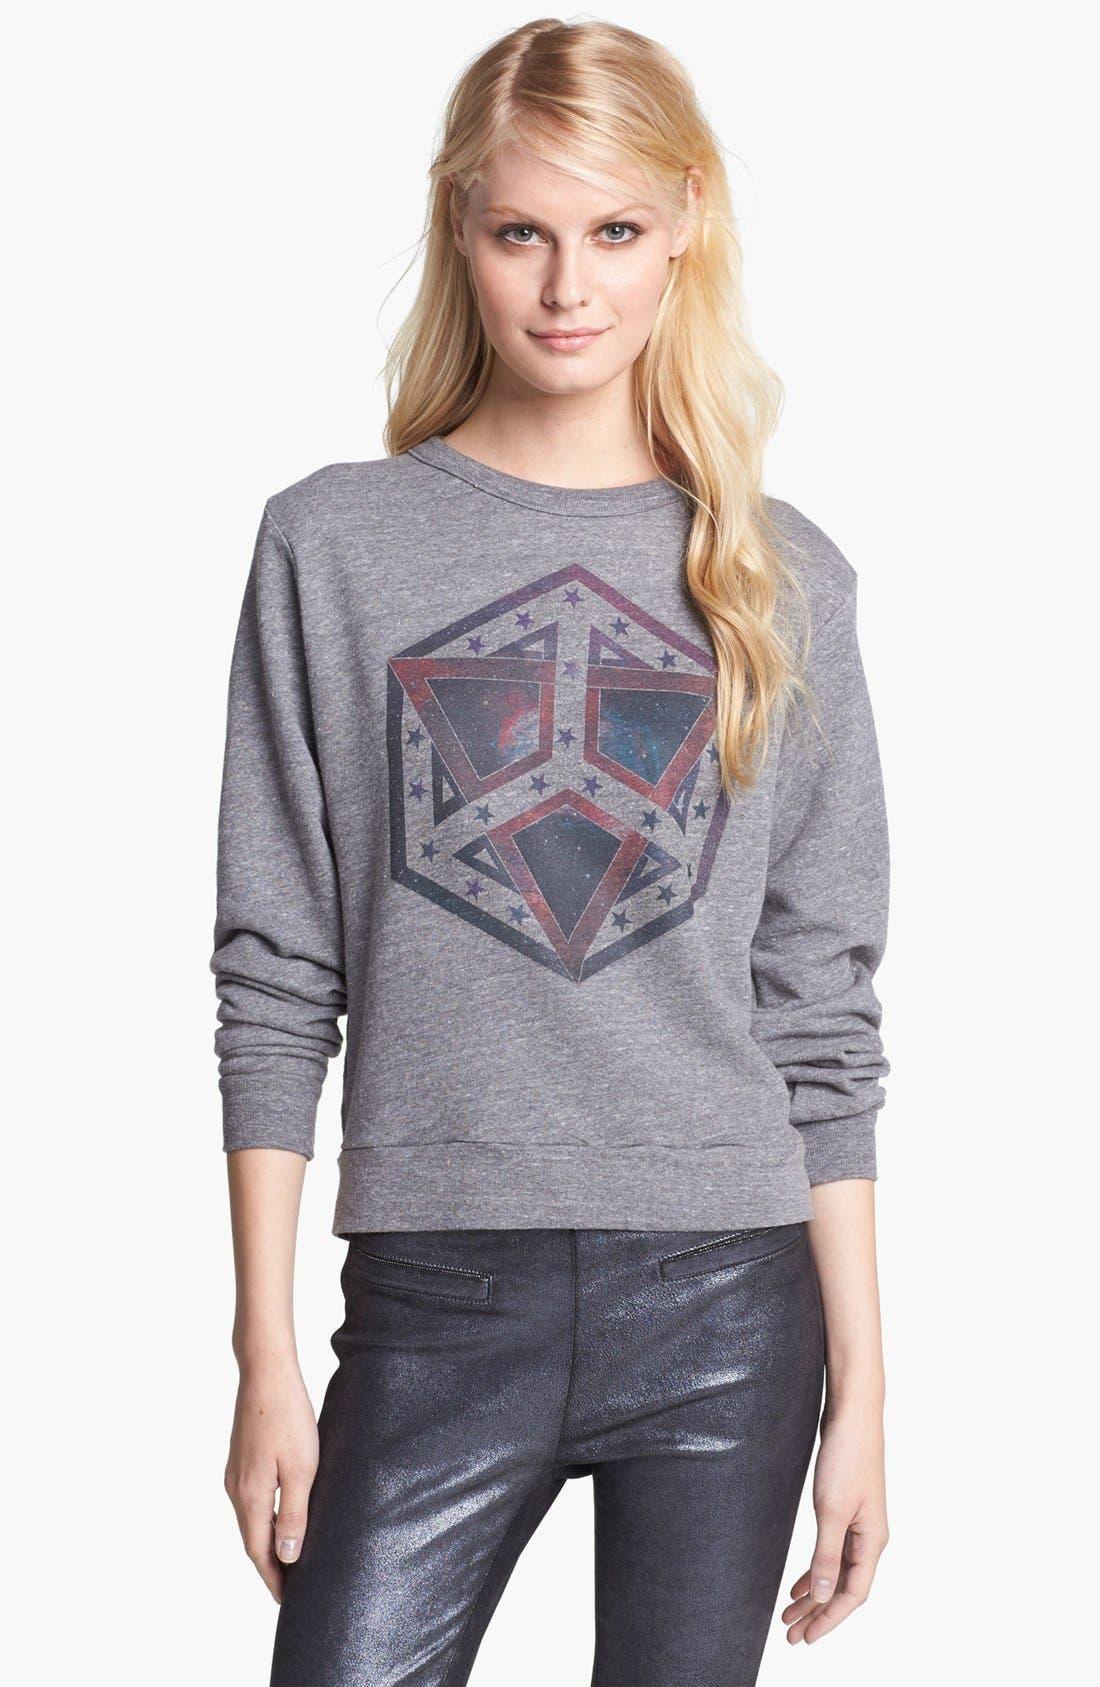 Alternate Image 1 Selected - Rebecca Minkoff Graphic Sweatshirt